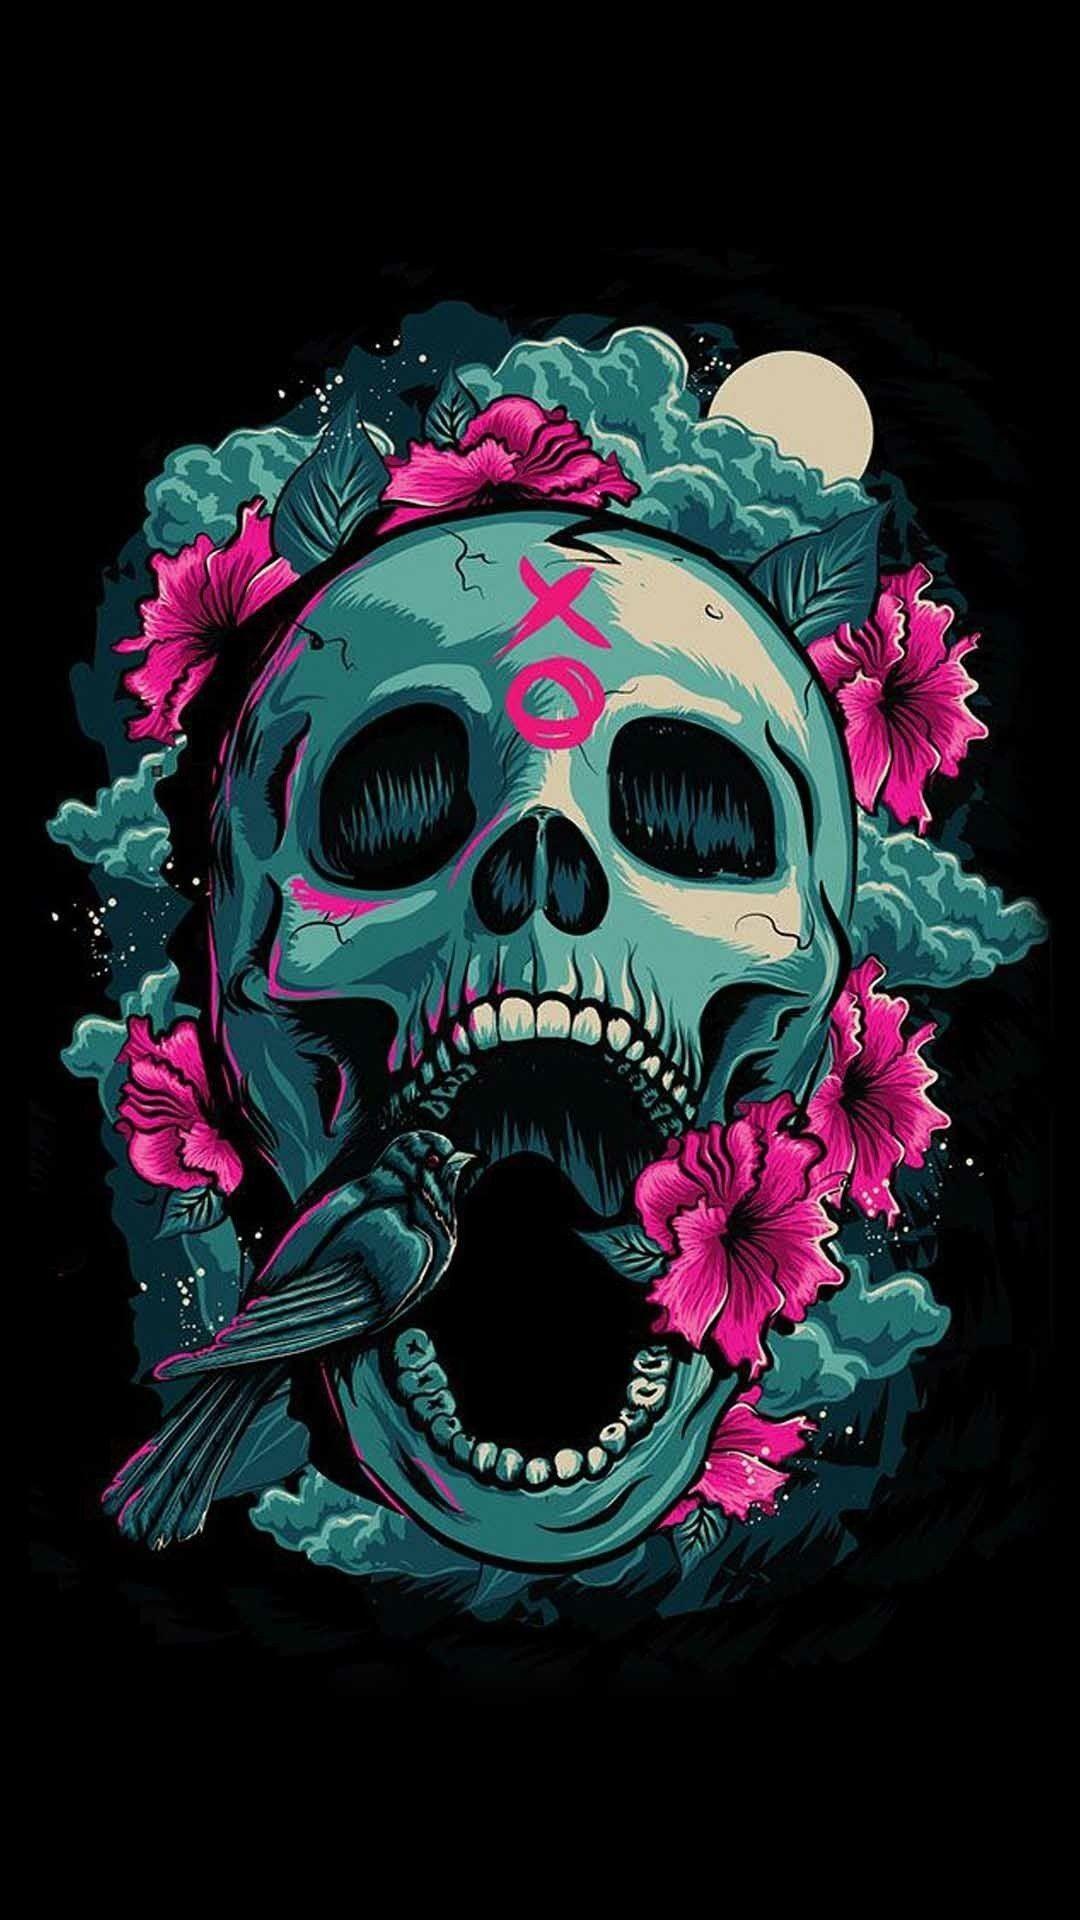 Sugar Skull Wallpaper for Home (69+ images)